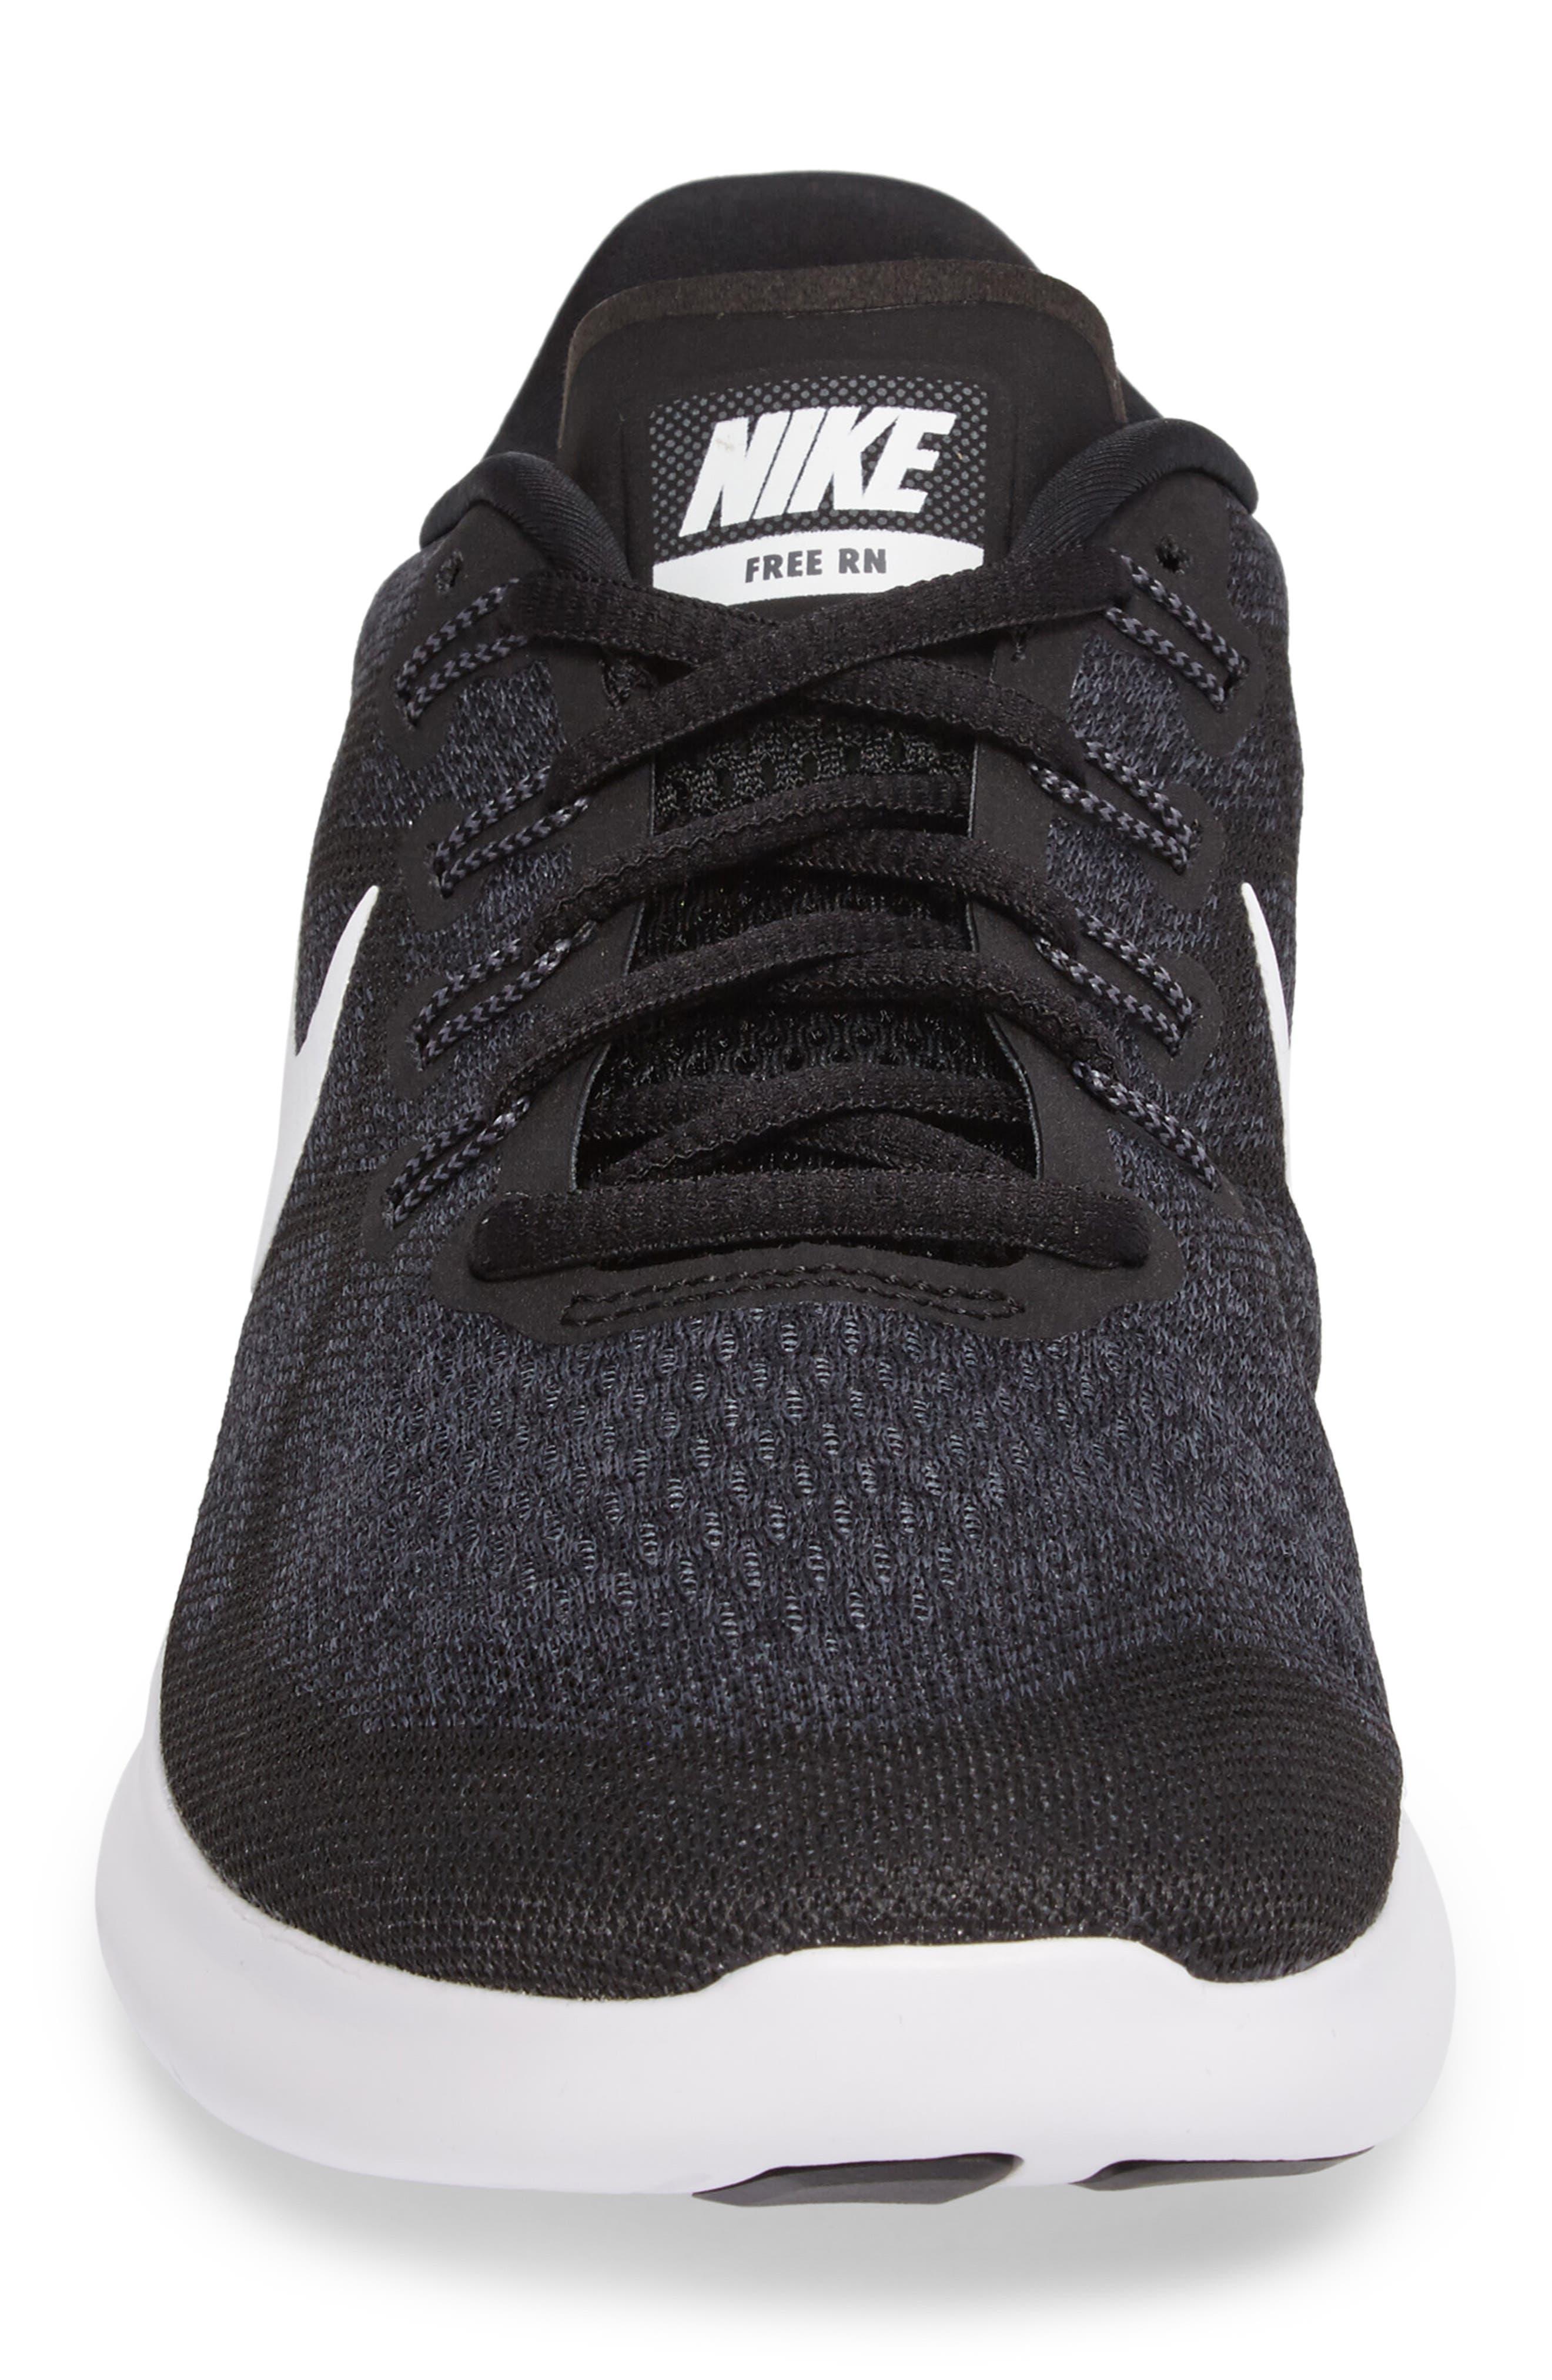 Free Run 2017 Running Shoe,                             Alternate thumbnail 4, color,                             Black/ White/ Grey/ Anthracite